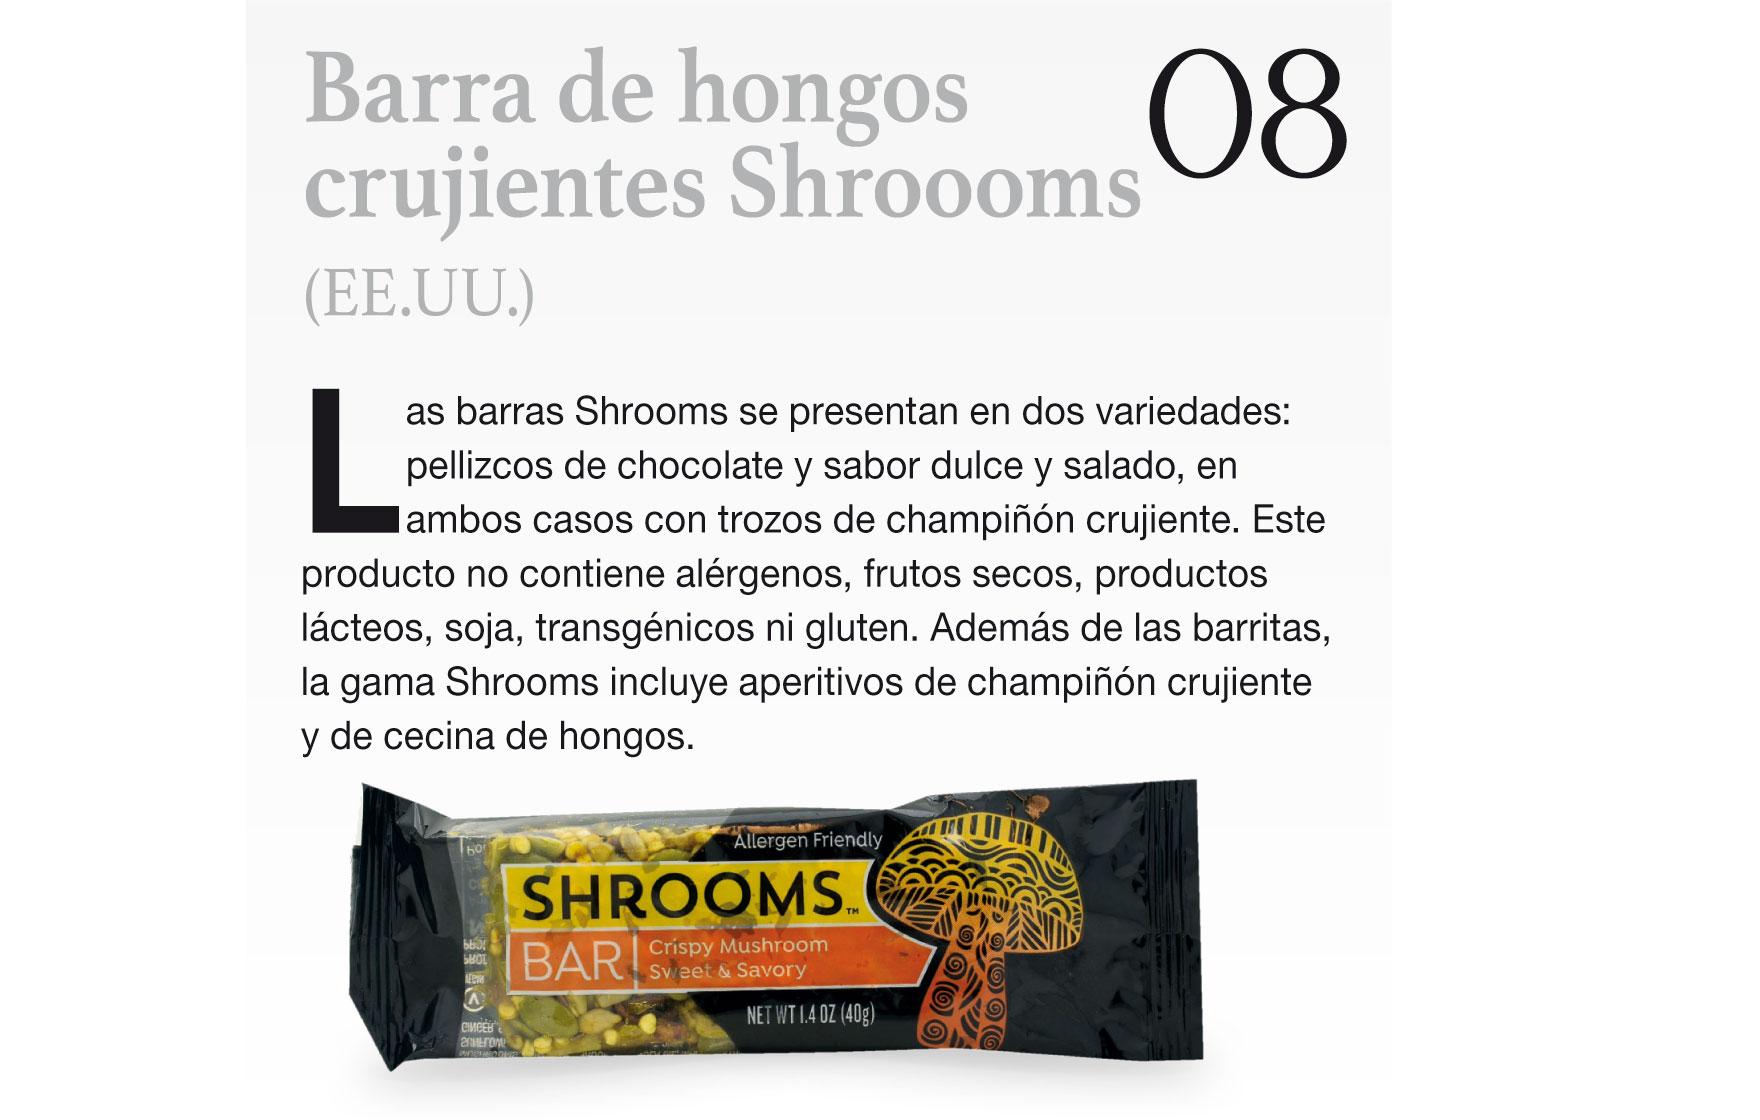 Barra de hongos crujientes Shroooms (EE.UU.)